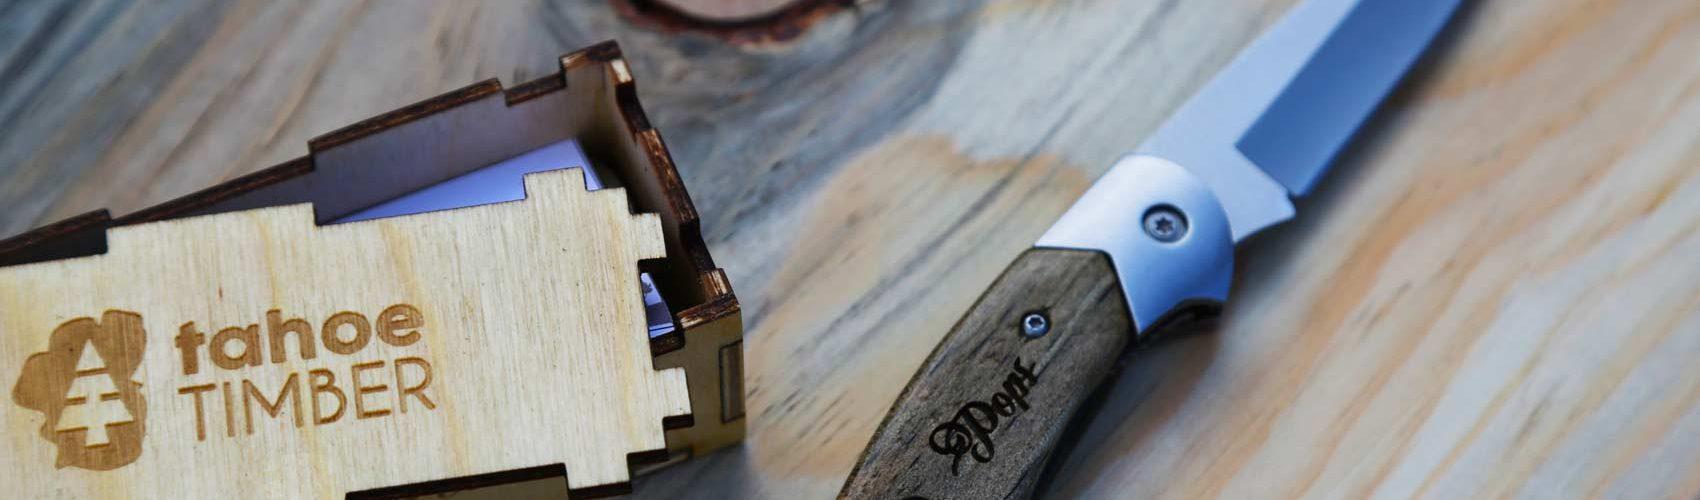 Custom Wooden Pocket Knife